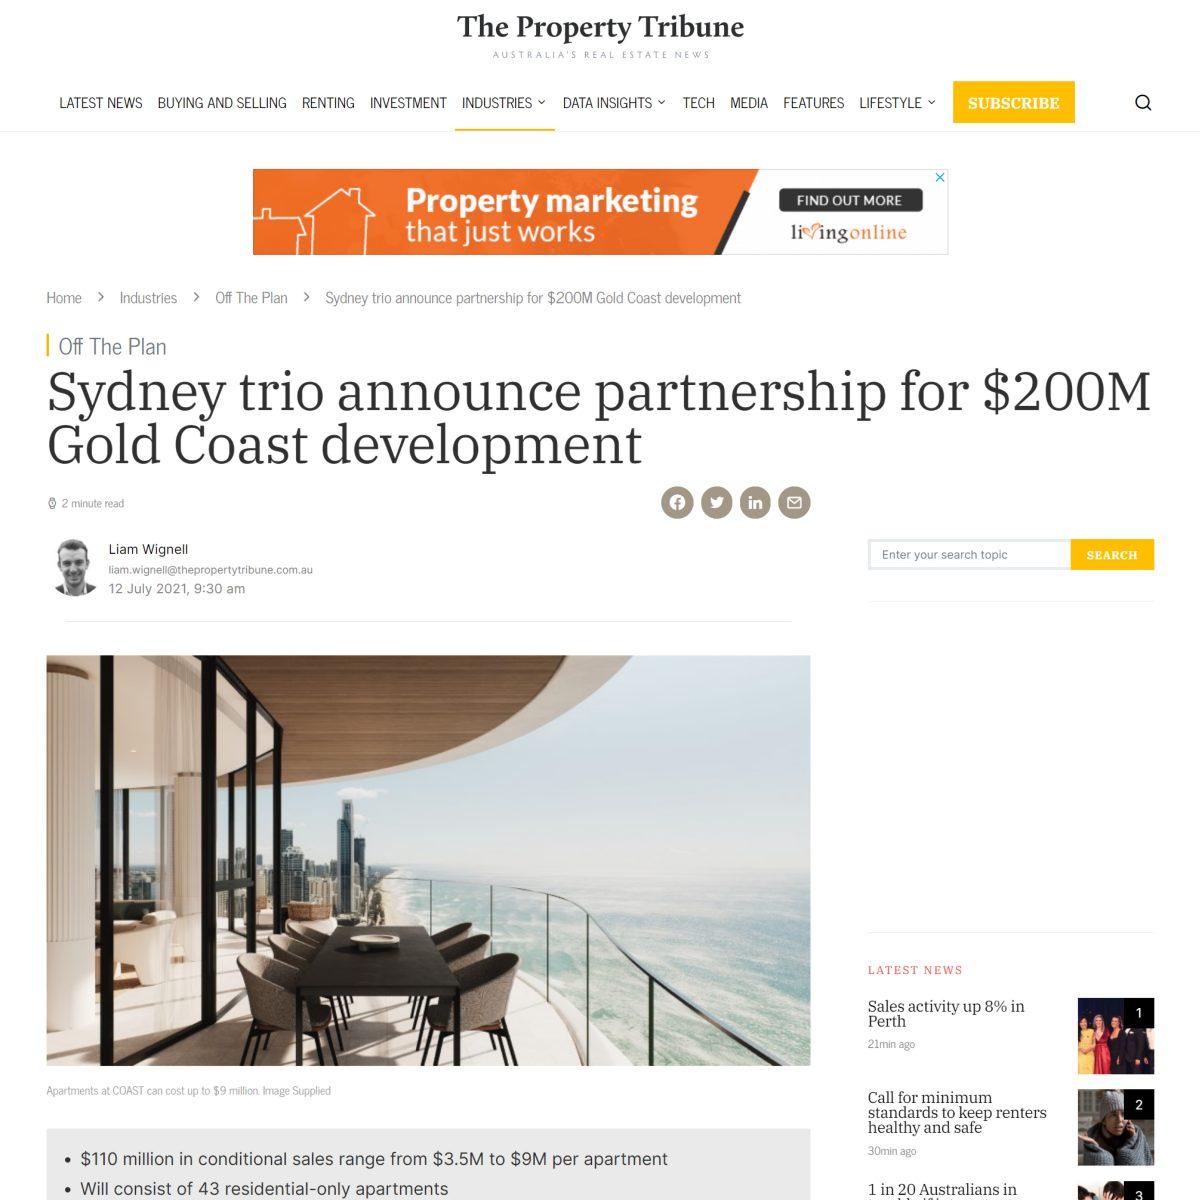 Sydney trio announce partnerships for $200M Gold Coast development